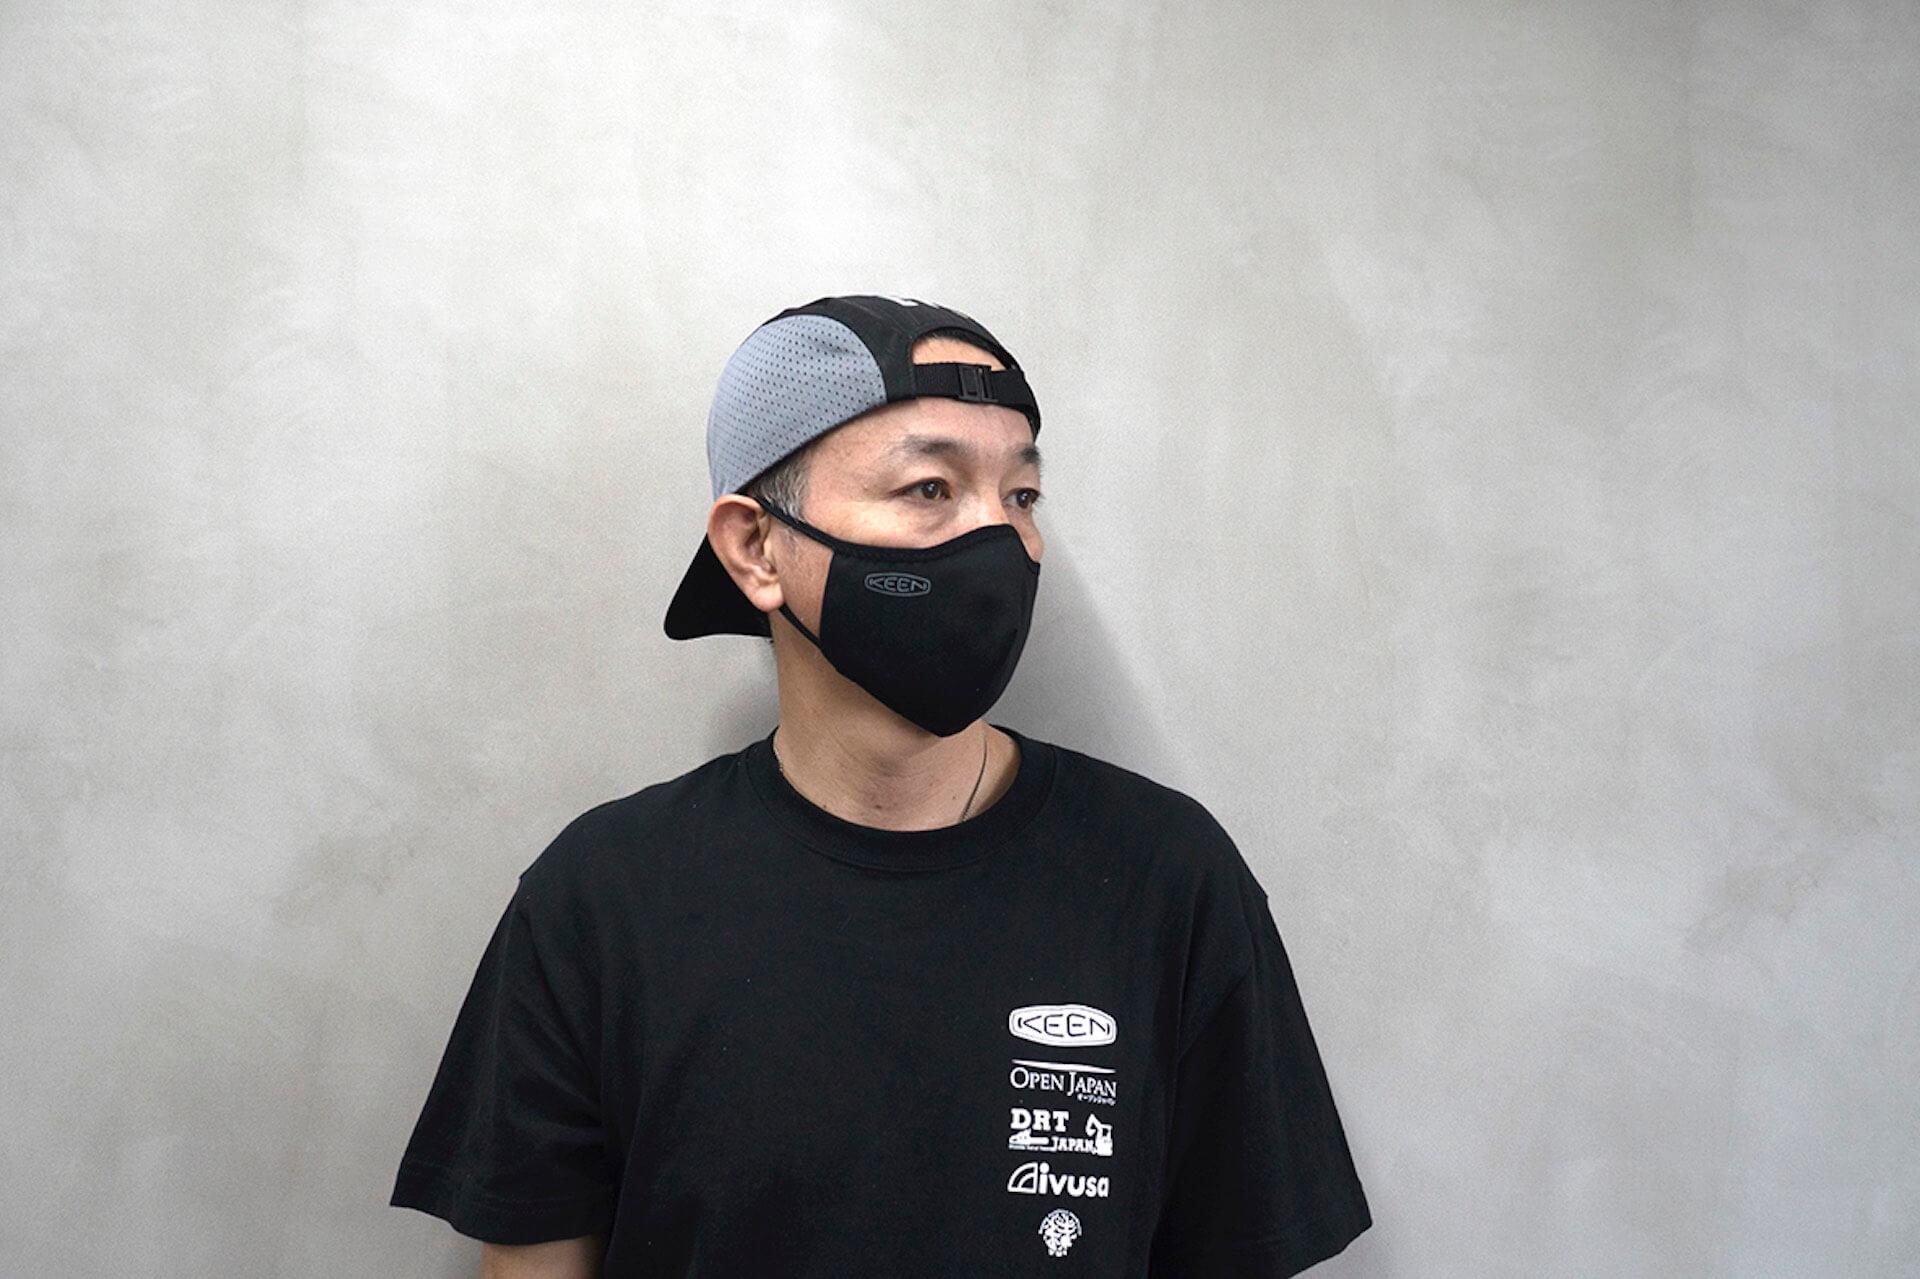 KEENがマスク15万枚を無償提供|タイの自社工場で洗って使えるリバーシブル立体マスクの製造を開始 lf200424_keen_mask_03